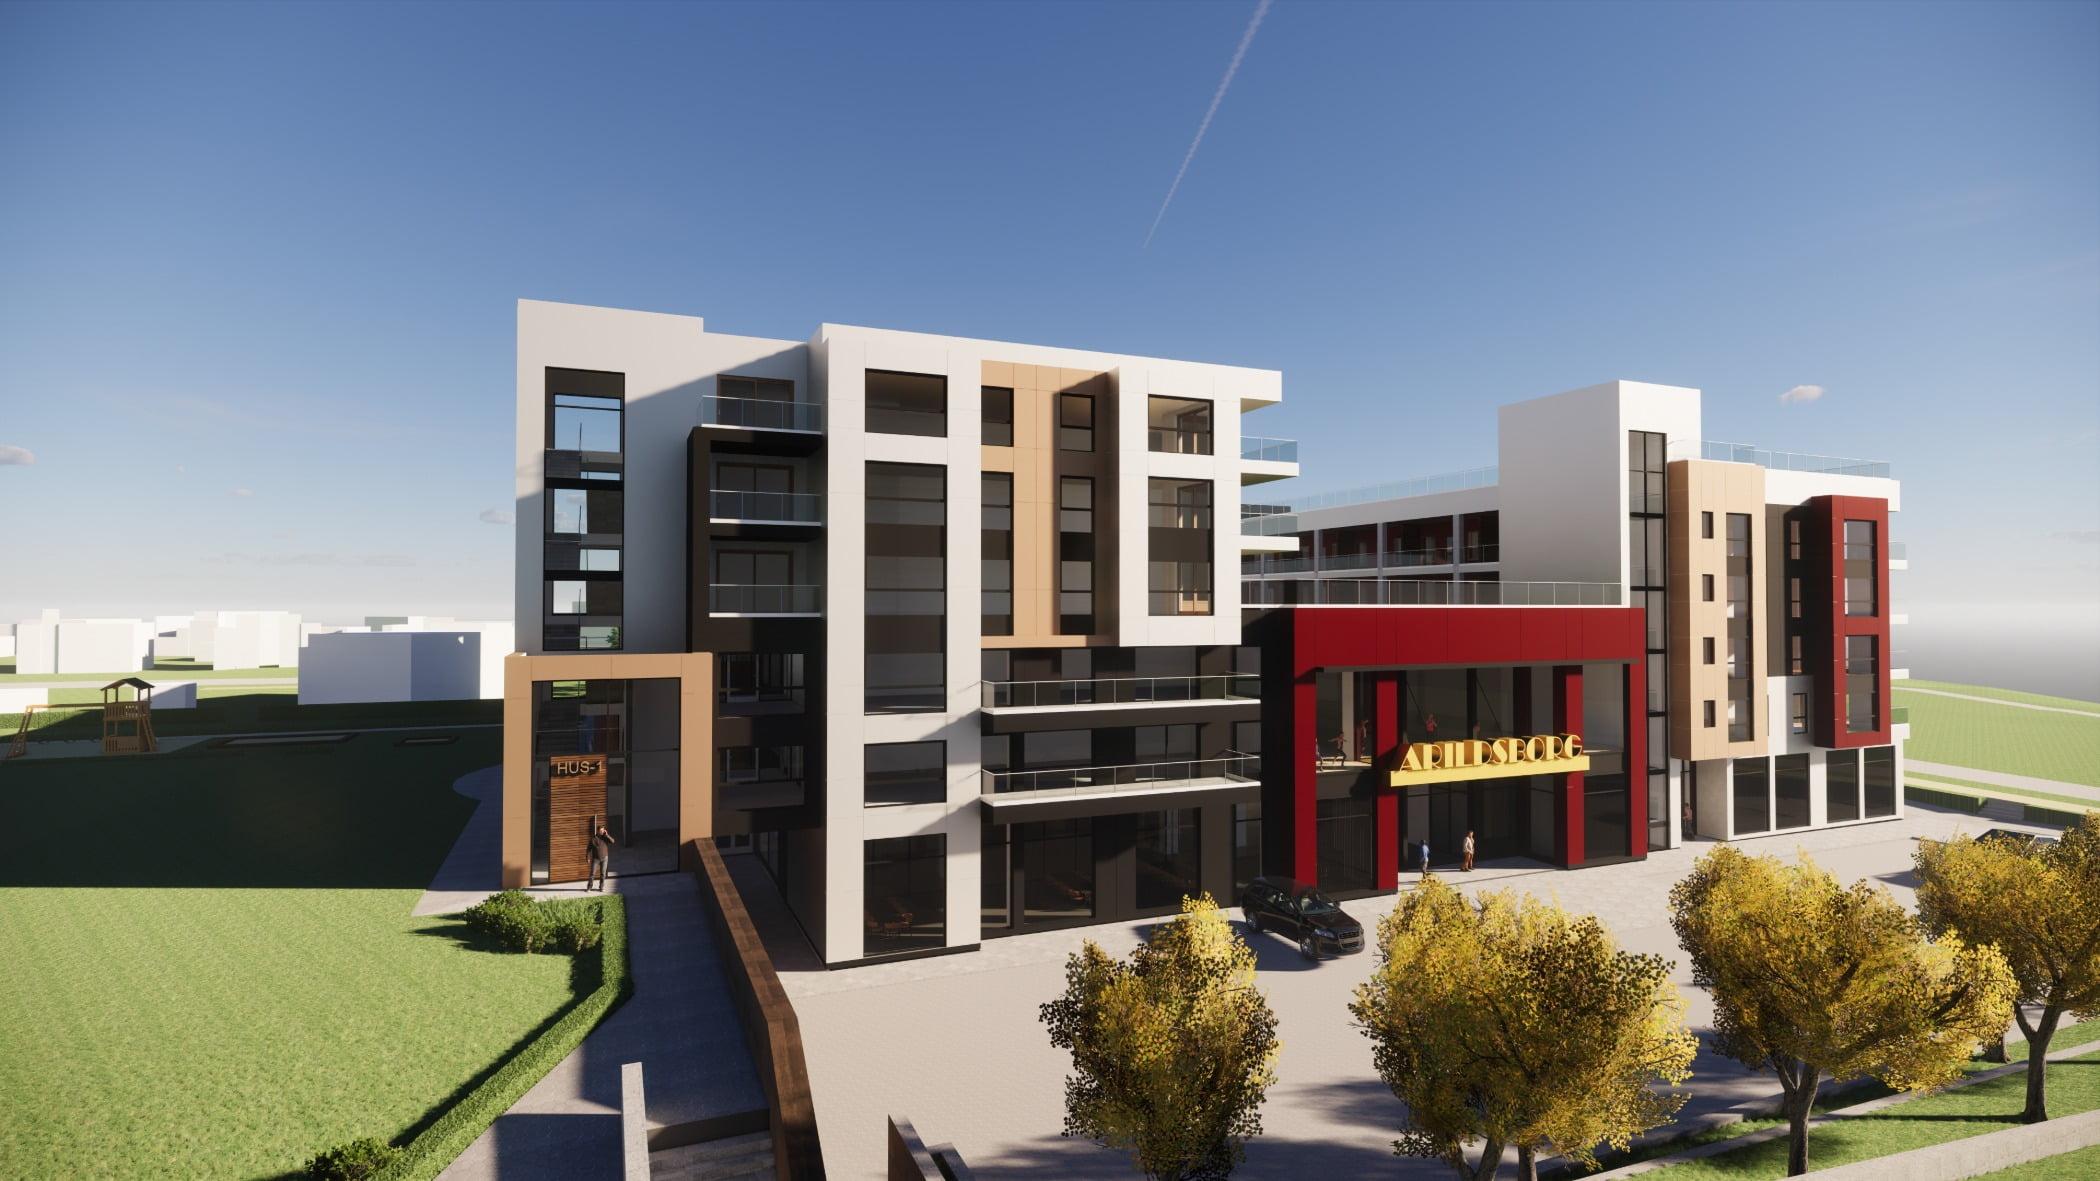 Interior design, Tower block, Land lot, Residential area, Plant, Building, Sky, Condominium, Neighbourhood